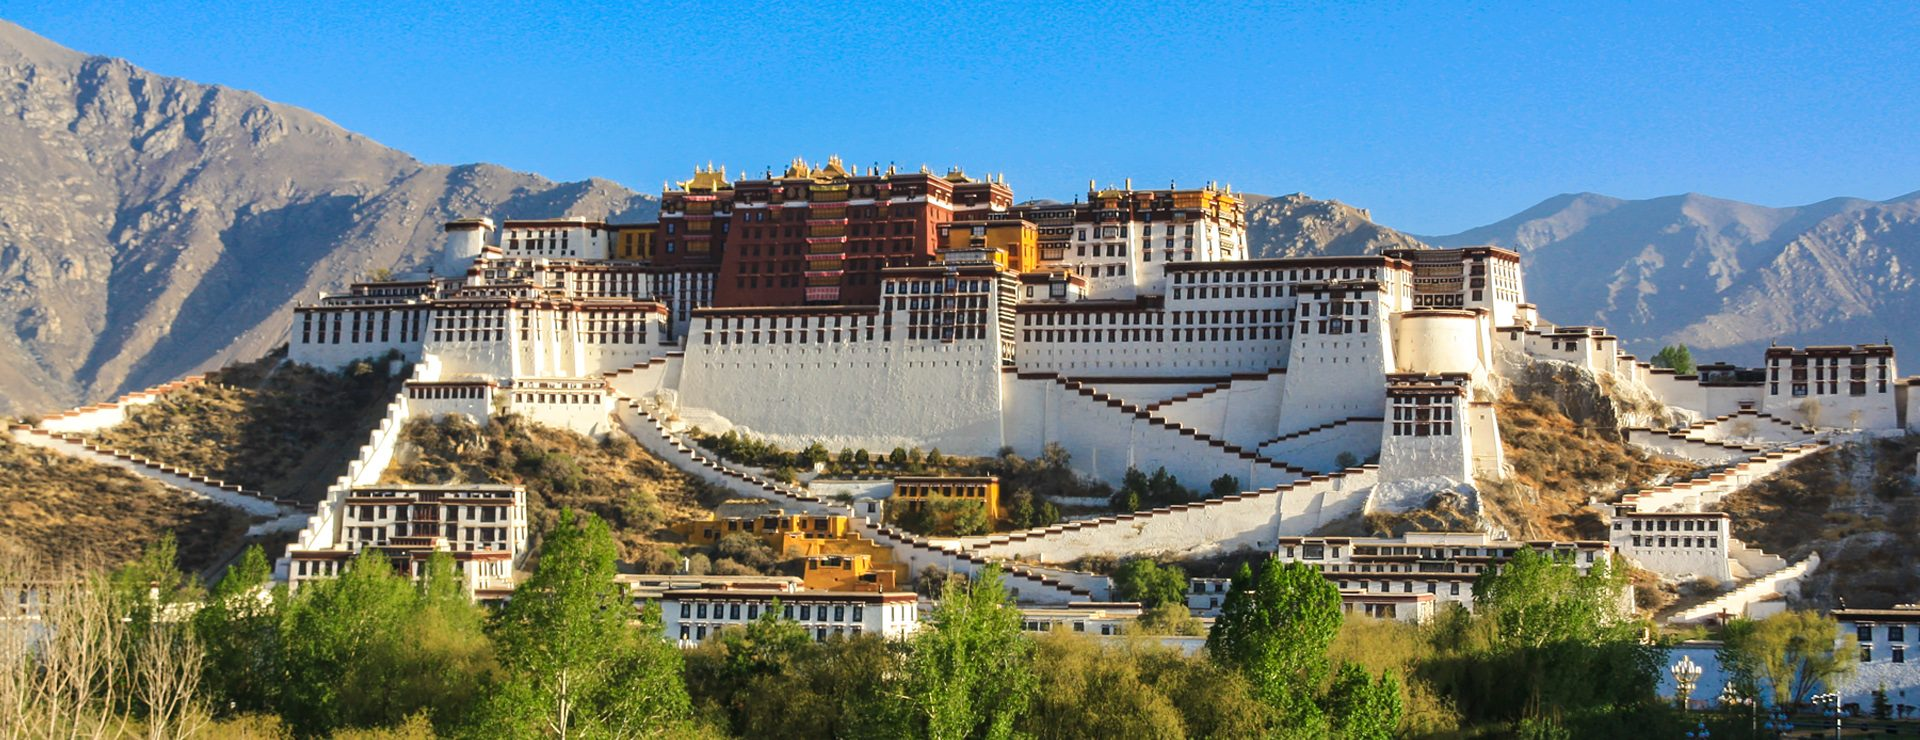 Stora Tibetresan